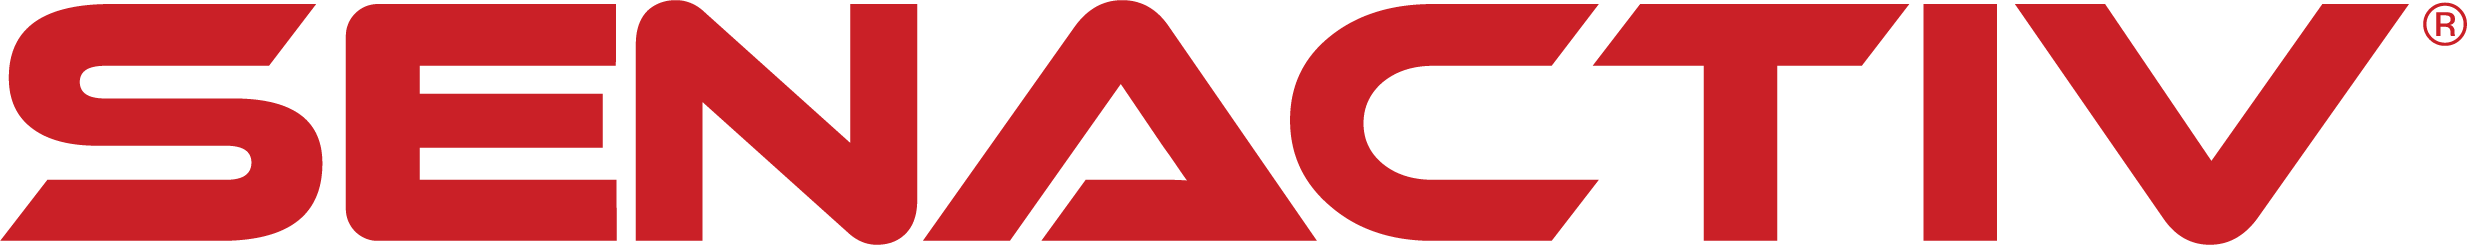 Senactiv-logo-red-2